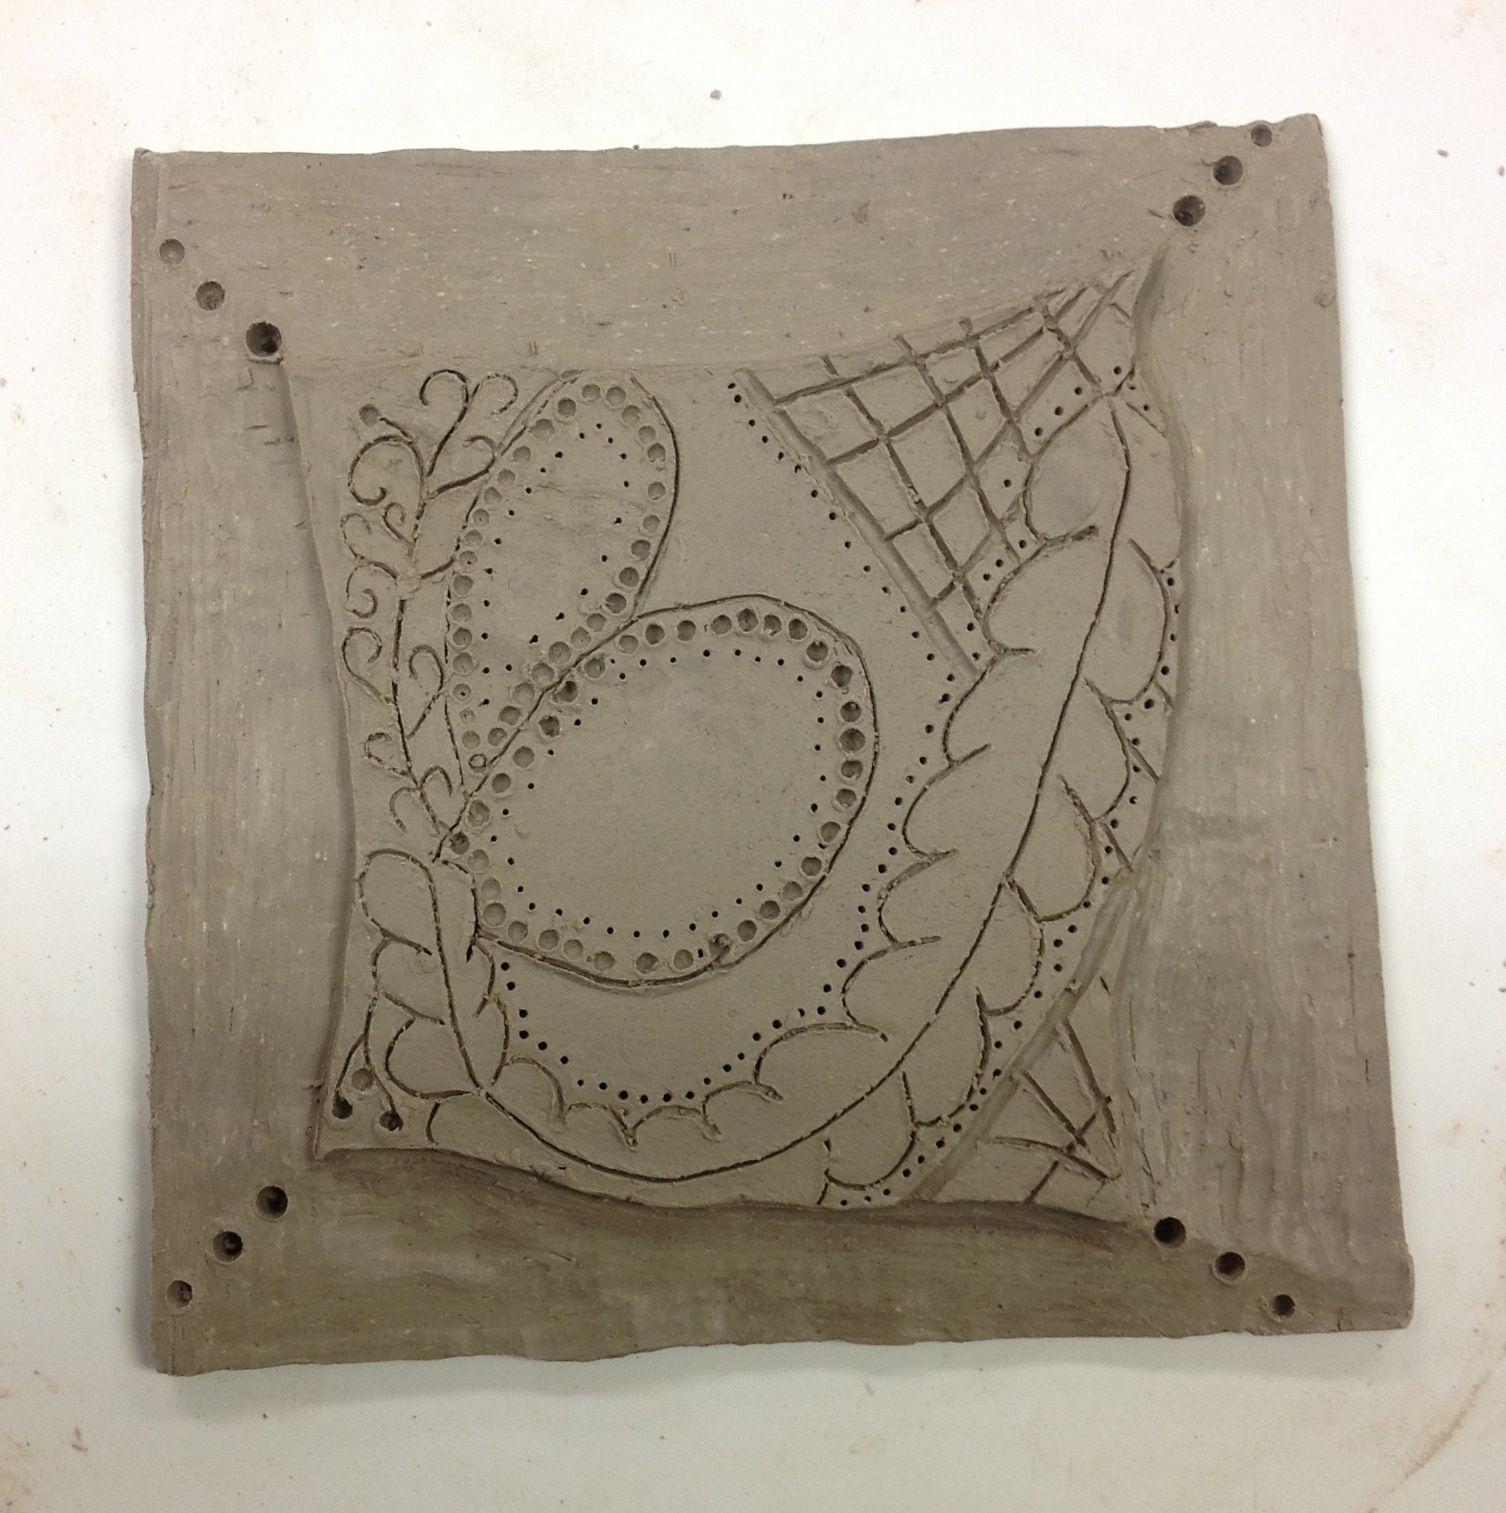 ceramic relief tile high school ceramic lessons pinterest. Black Bedroom Furniture Sets. Home Design Ideas